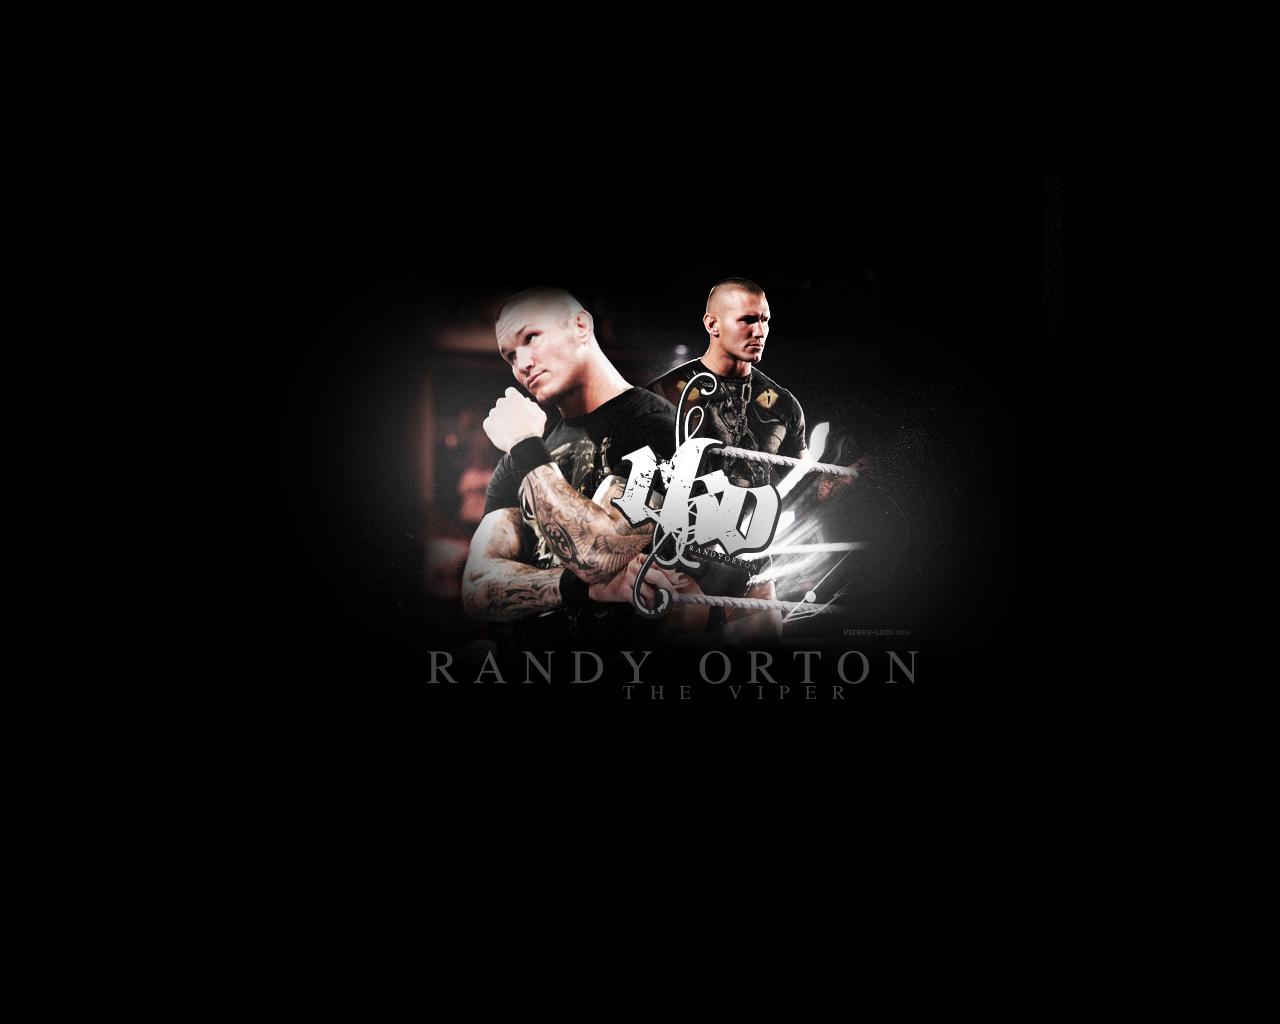 Randy Orton rKo 1280x1024